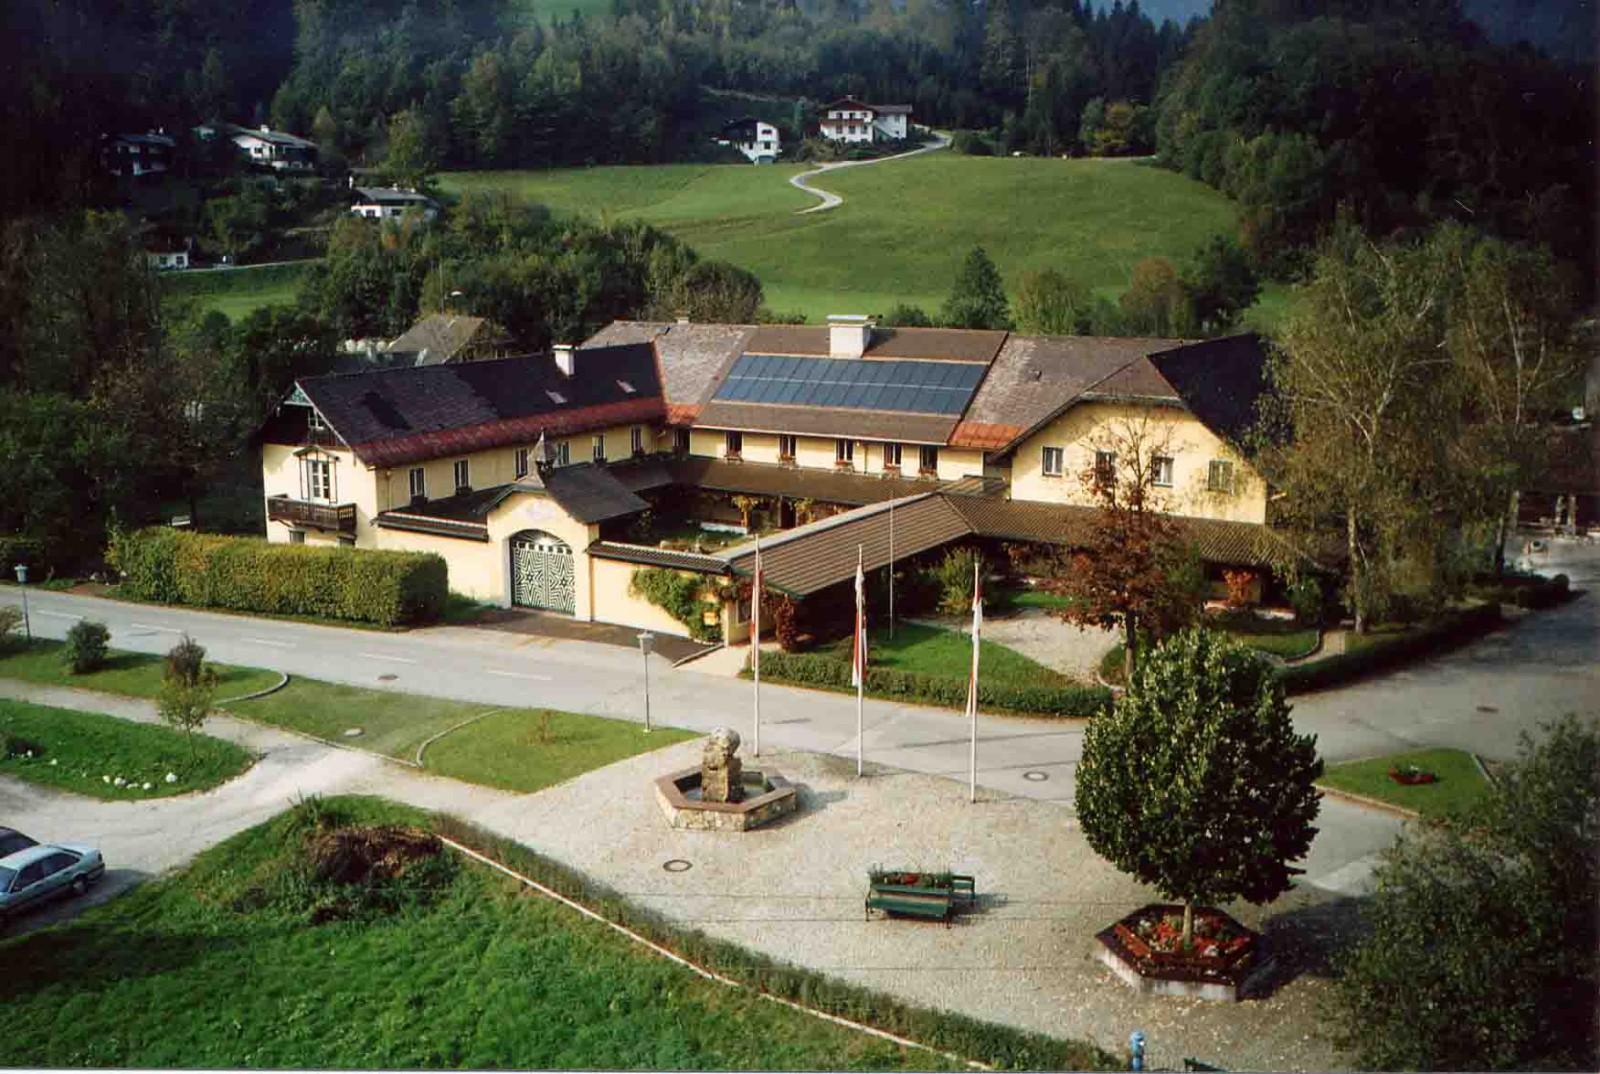 Kräuter, Tinkturen, Liköre und Balsame aus dem Kloster | SalzburgerLand Magazin